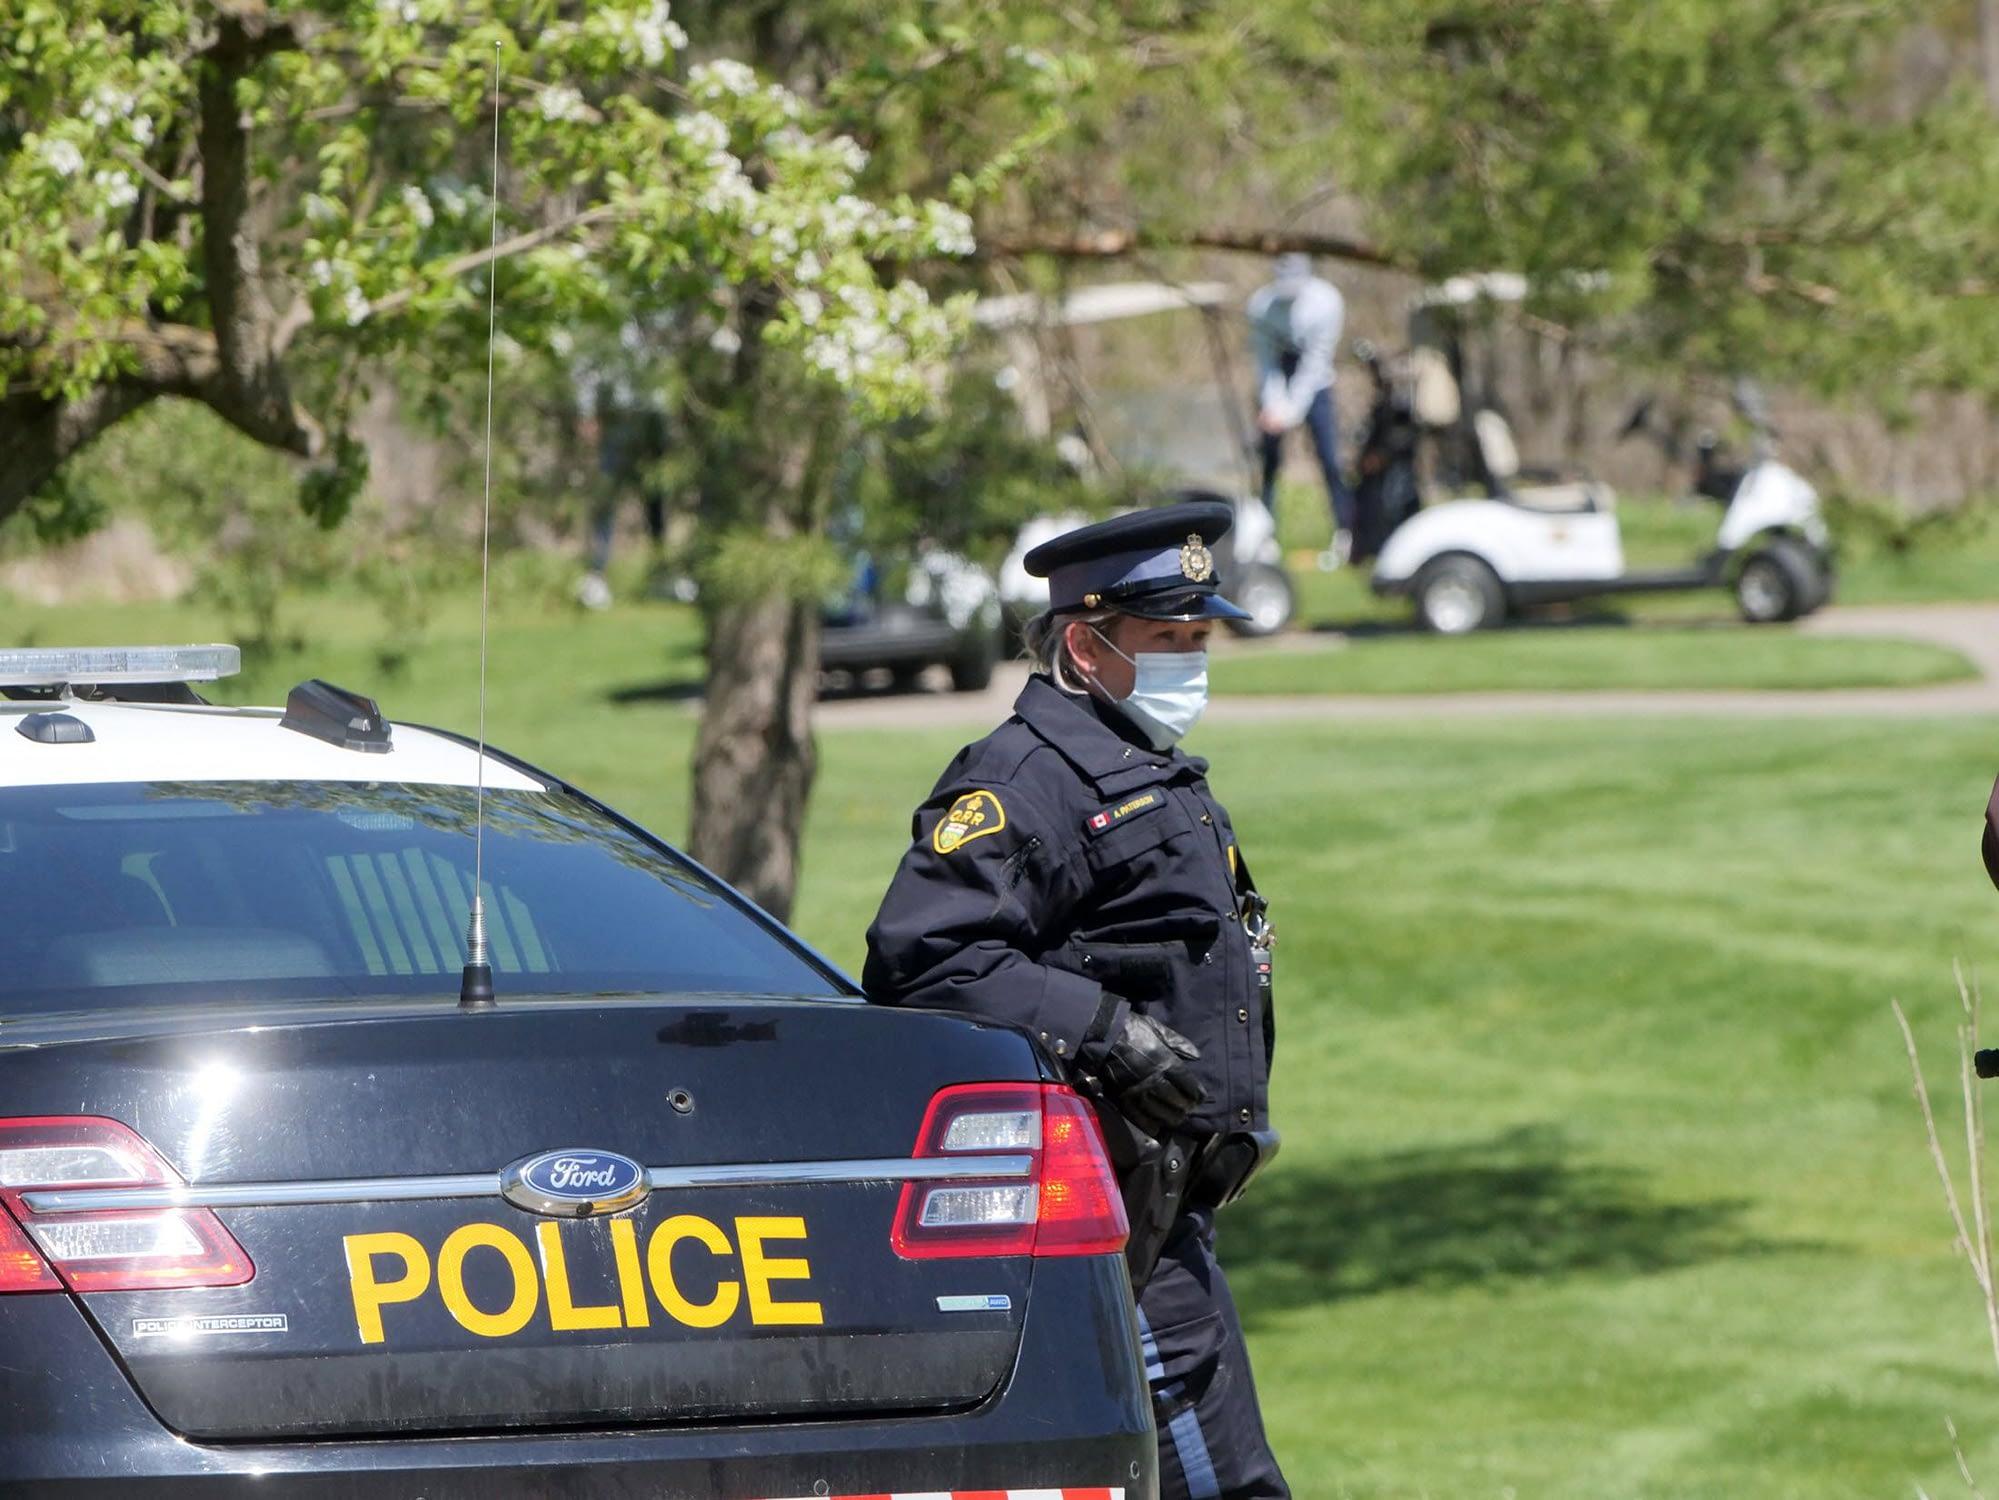 'Overbearing' enforcement: Defiant Tillsonburg golf course closes